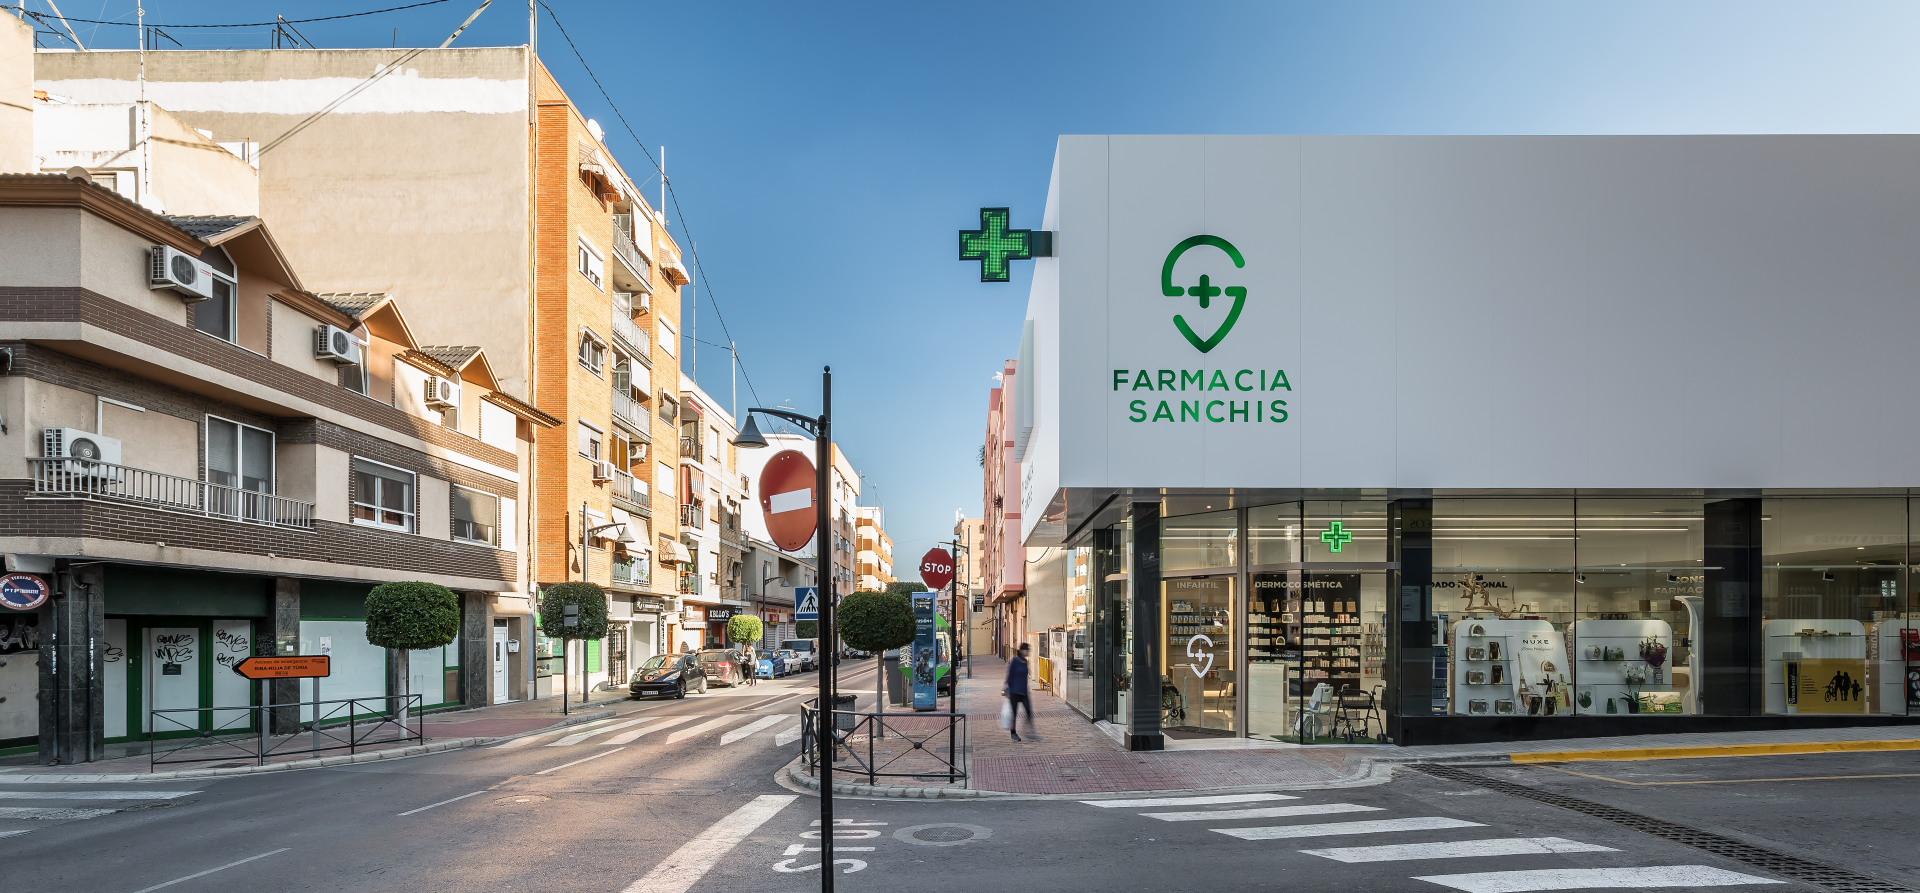 fotografia-arquitectura-valencia-german-cabo-d'estudio-farmacia-sanchis-ribarroja (4)